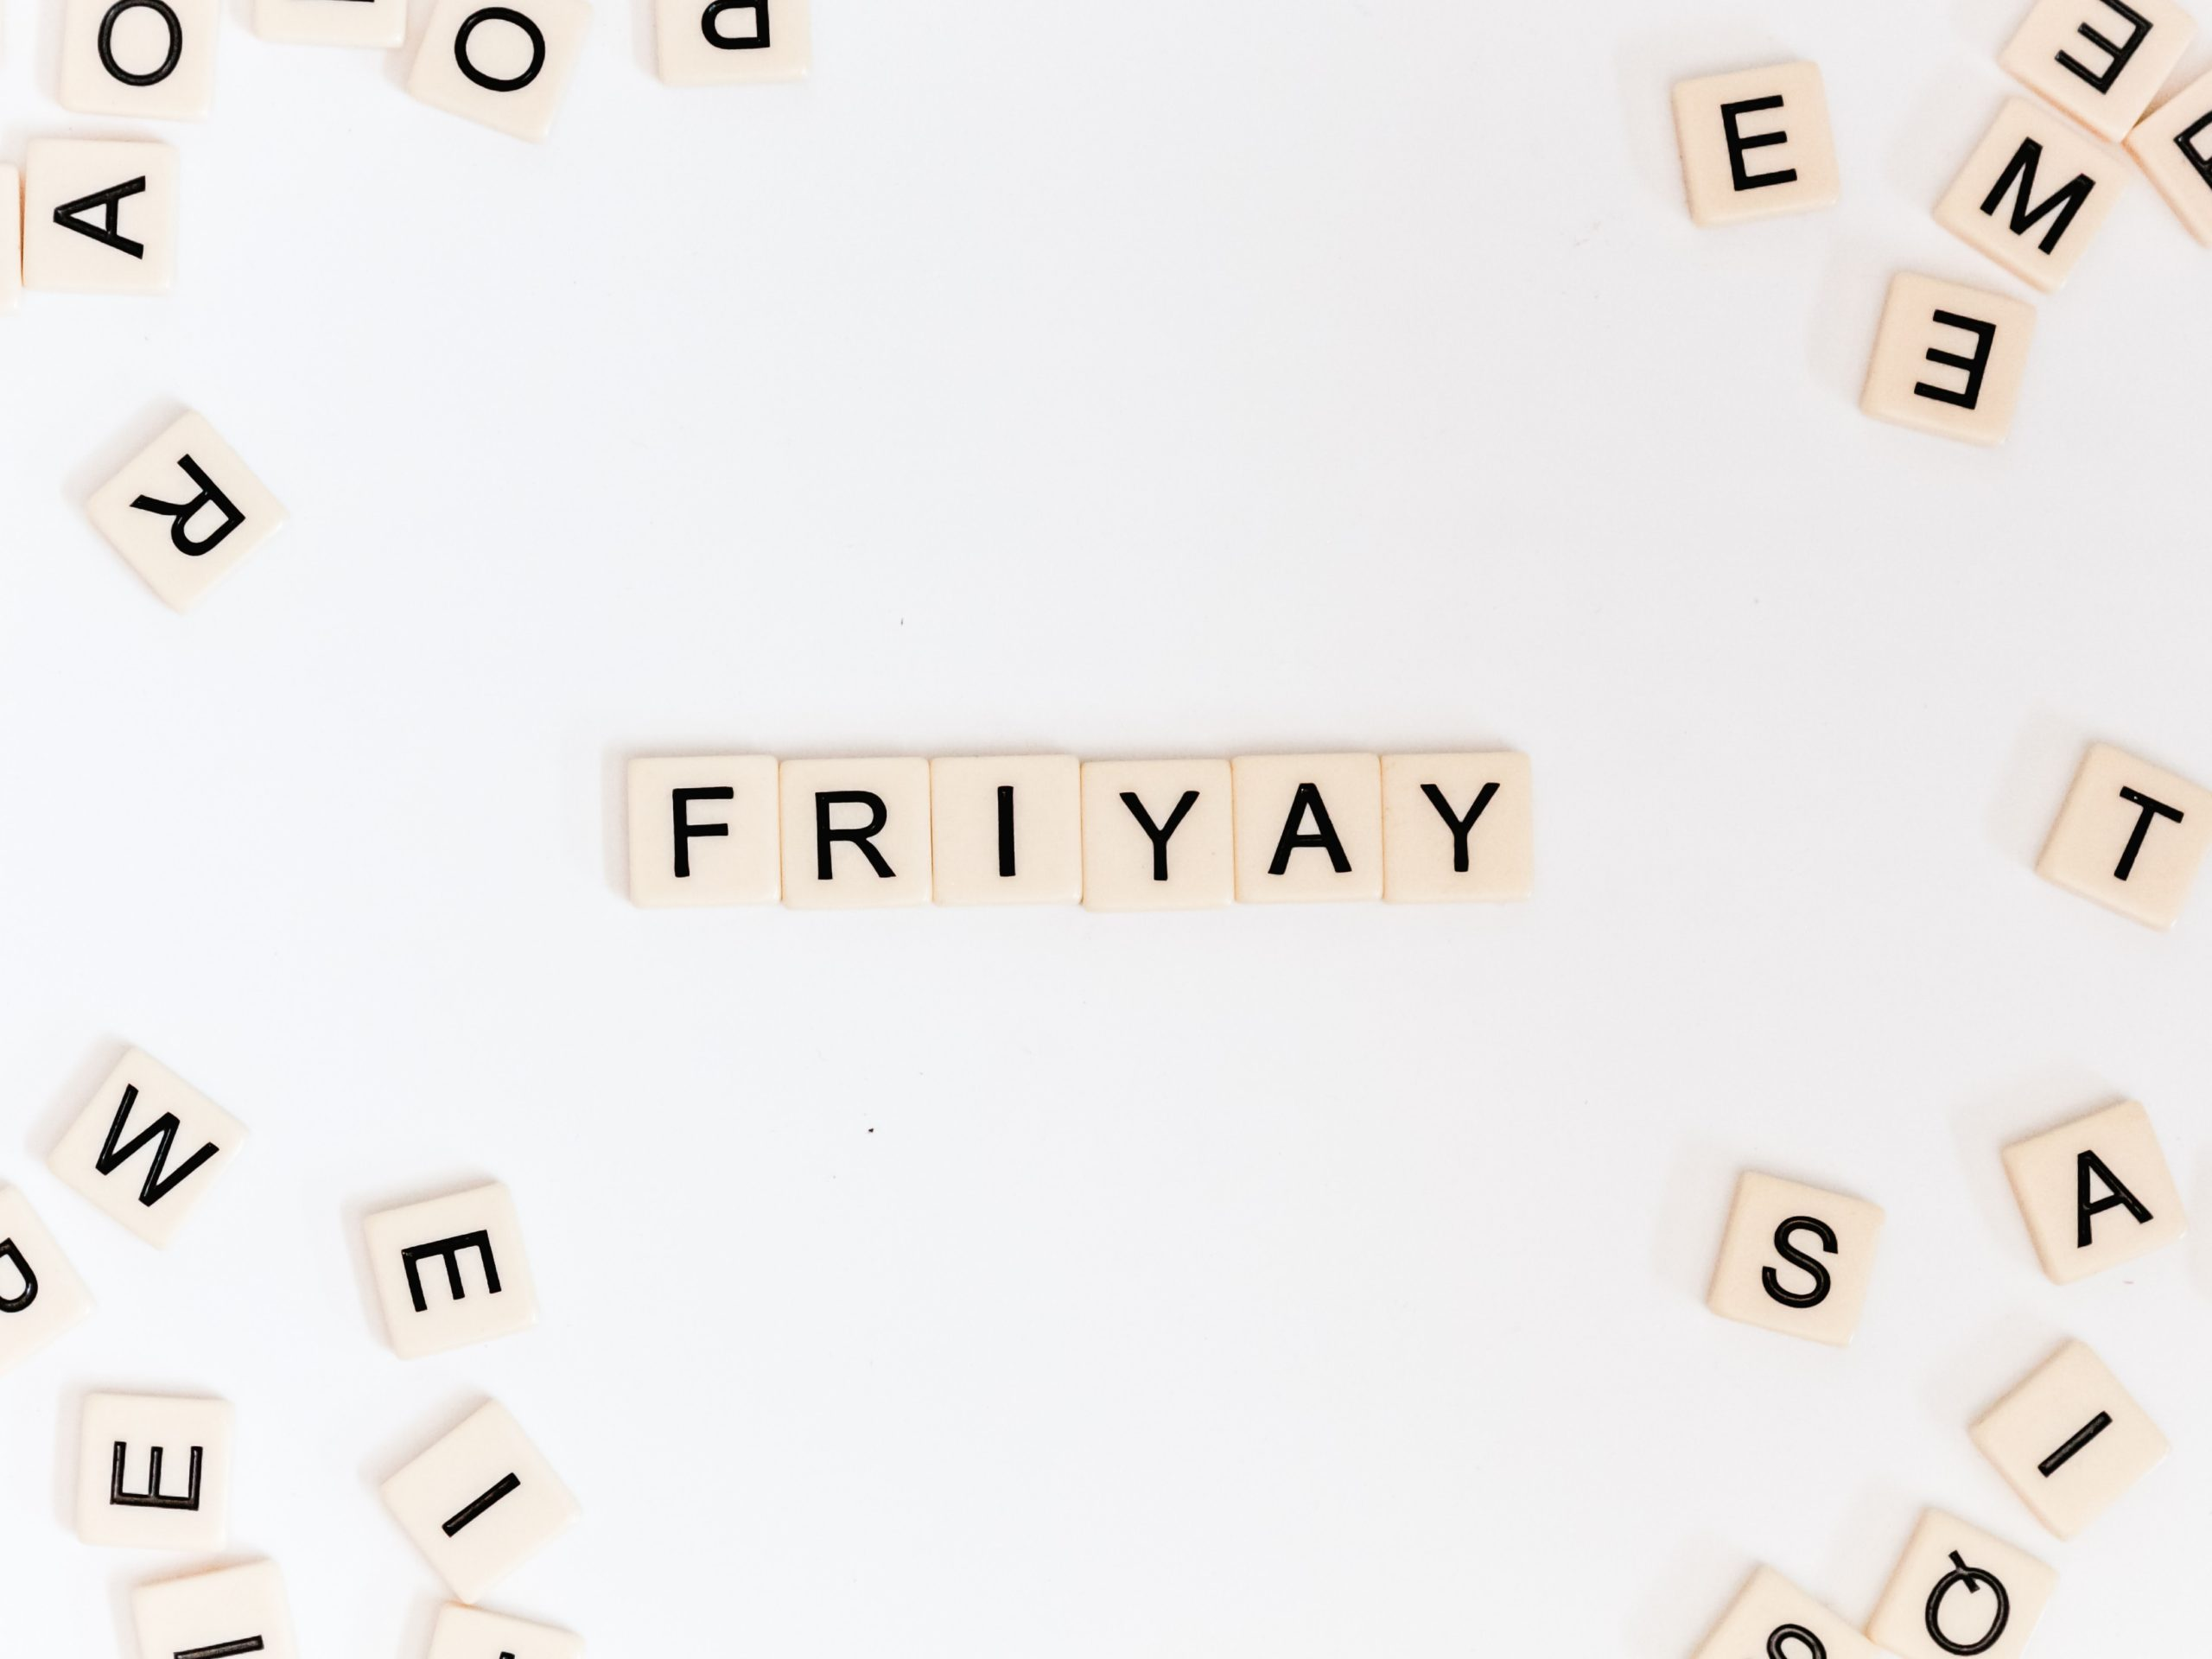 Misspelling of Friday